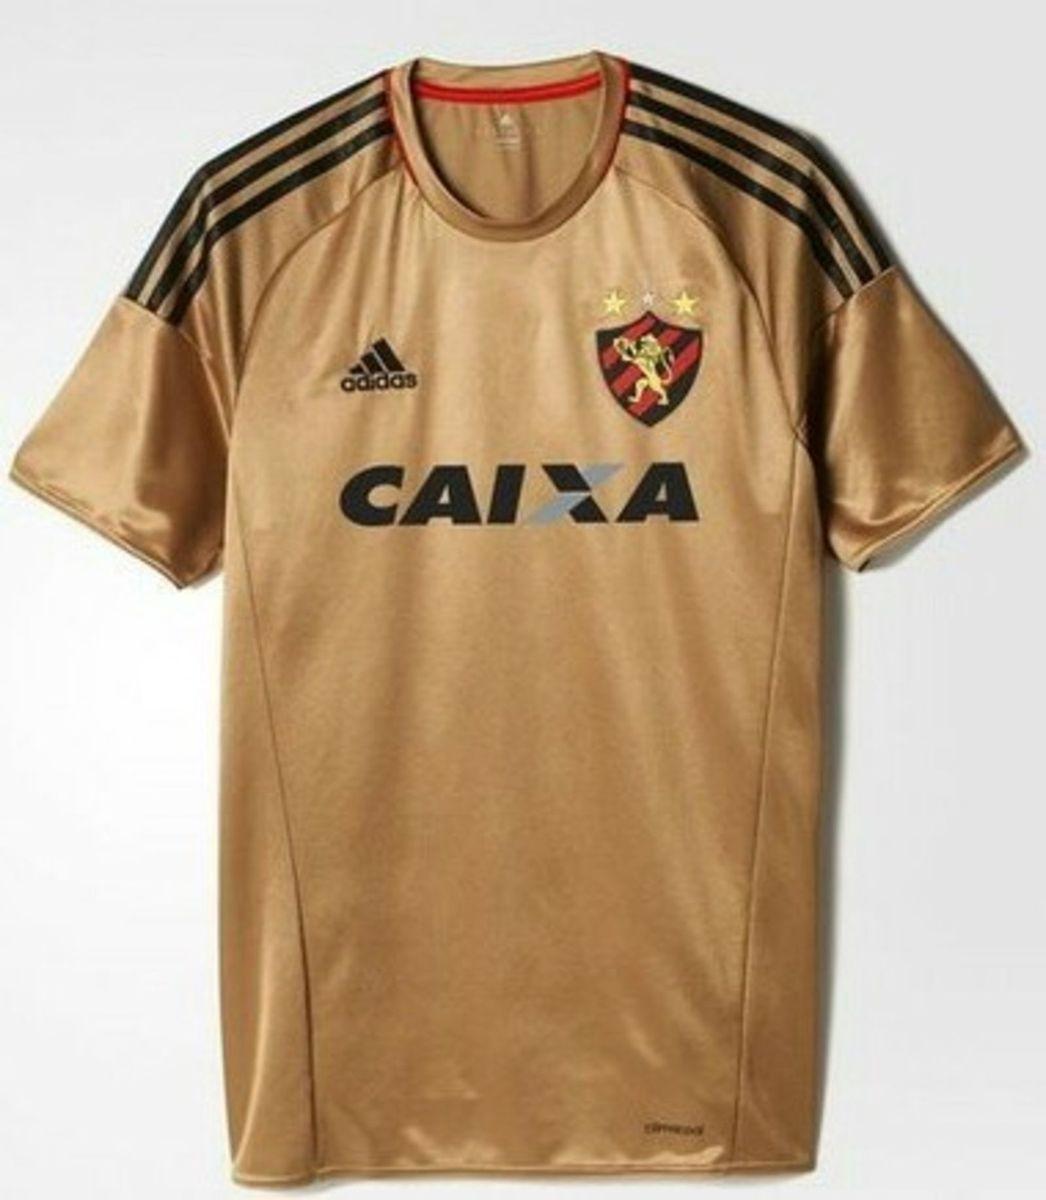 camisa sport recife - of 3 - adidas - camisas adidas 470dd2be96850